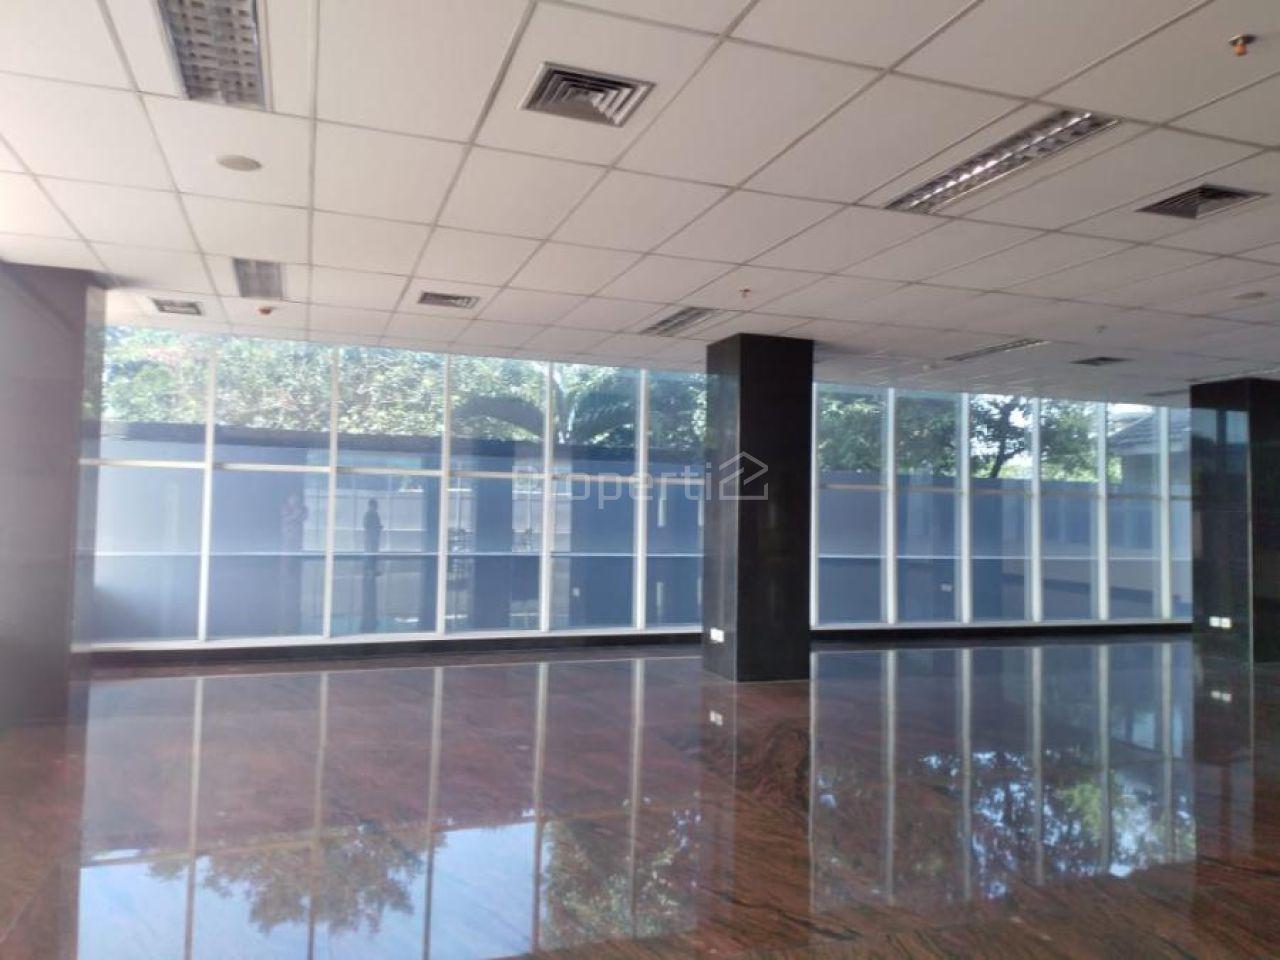 Gedung Kantor Baru di Kawasan Bisnis TB Simatupang, Jakarta Selatan